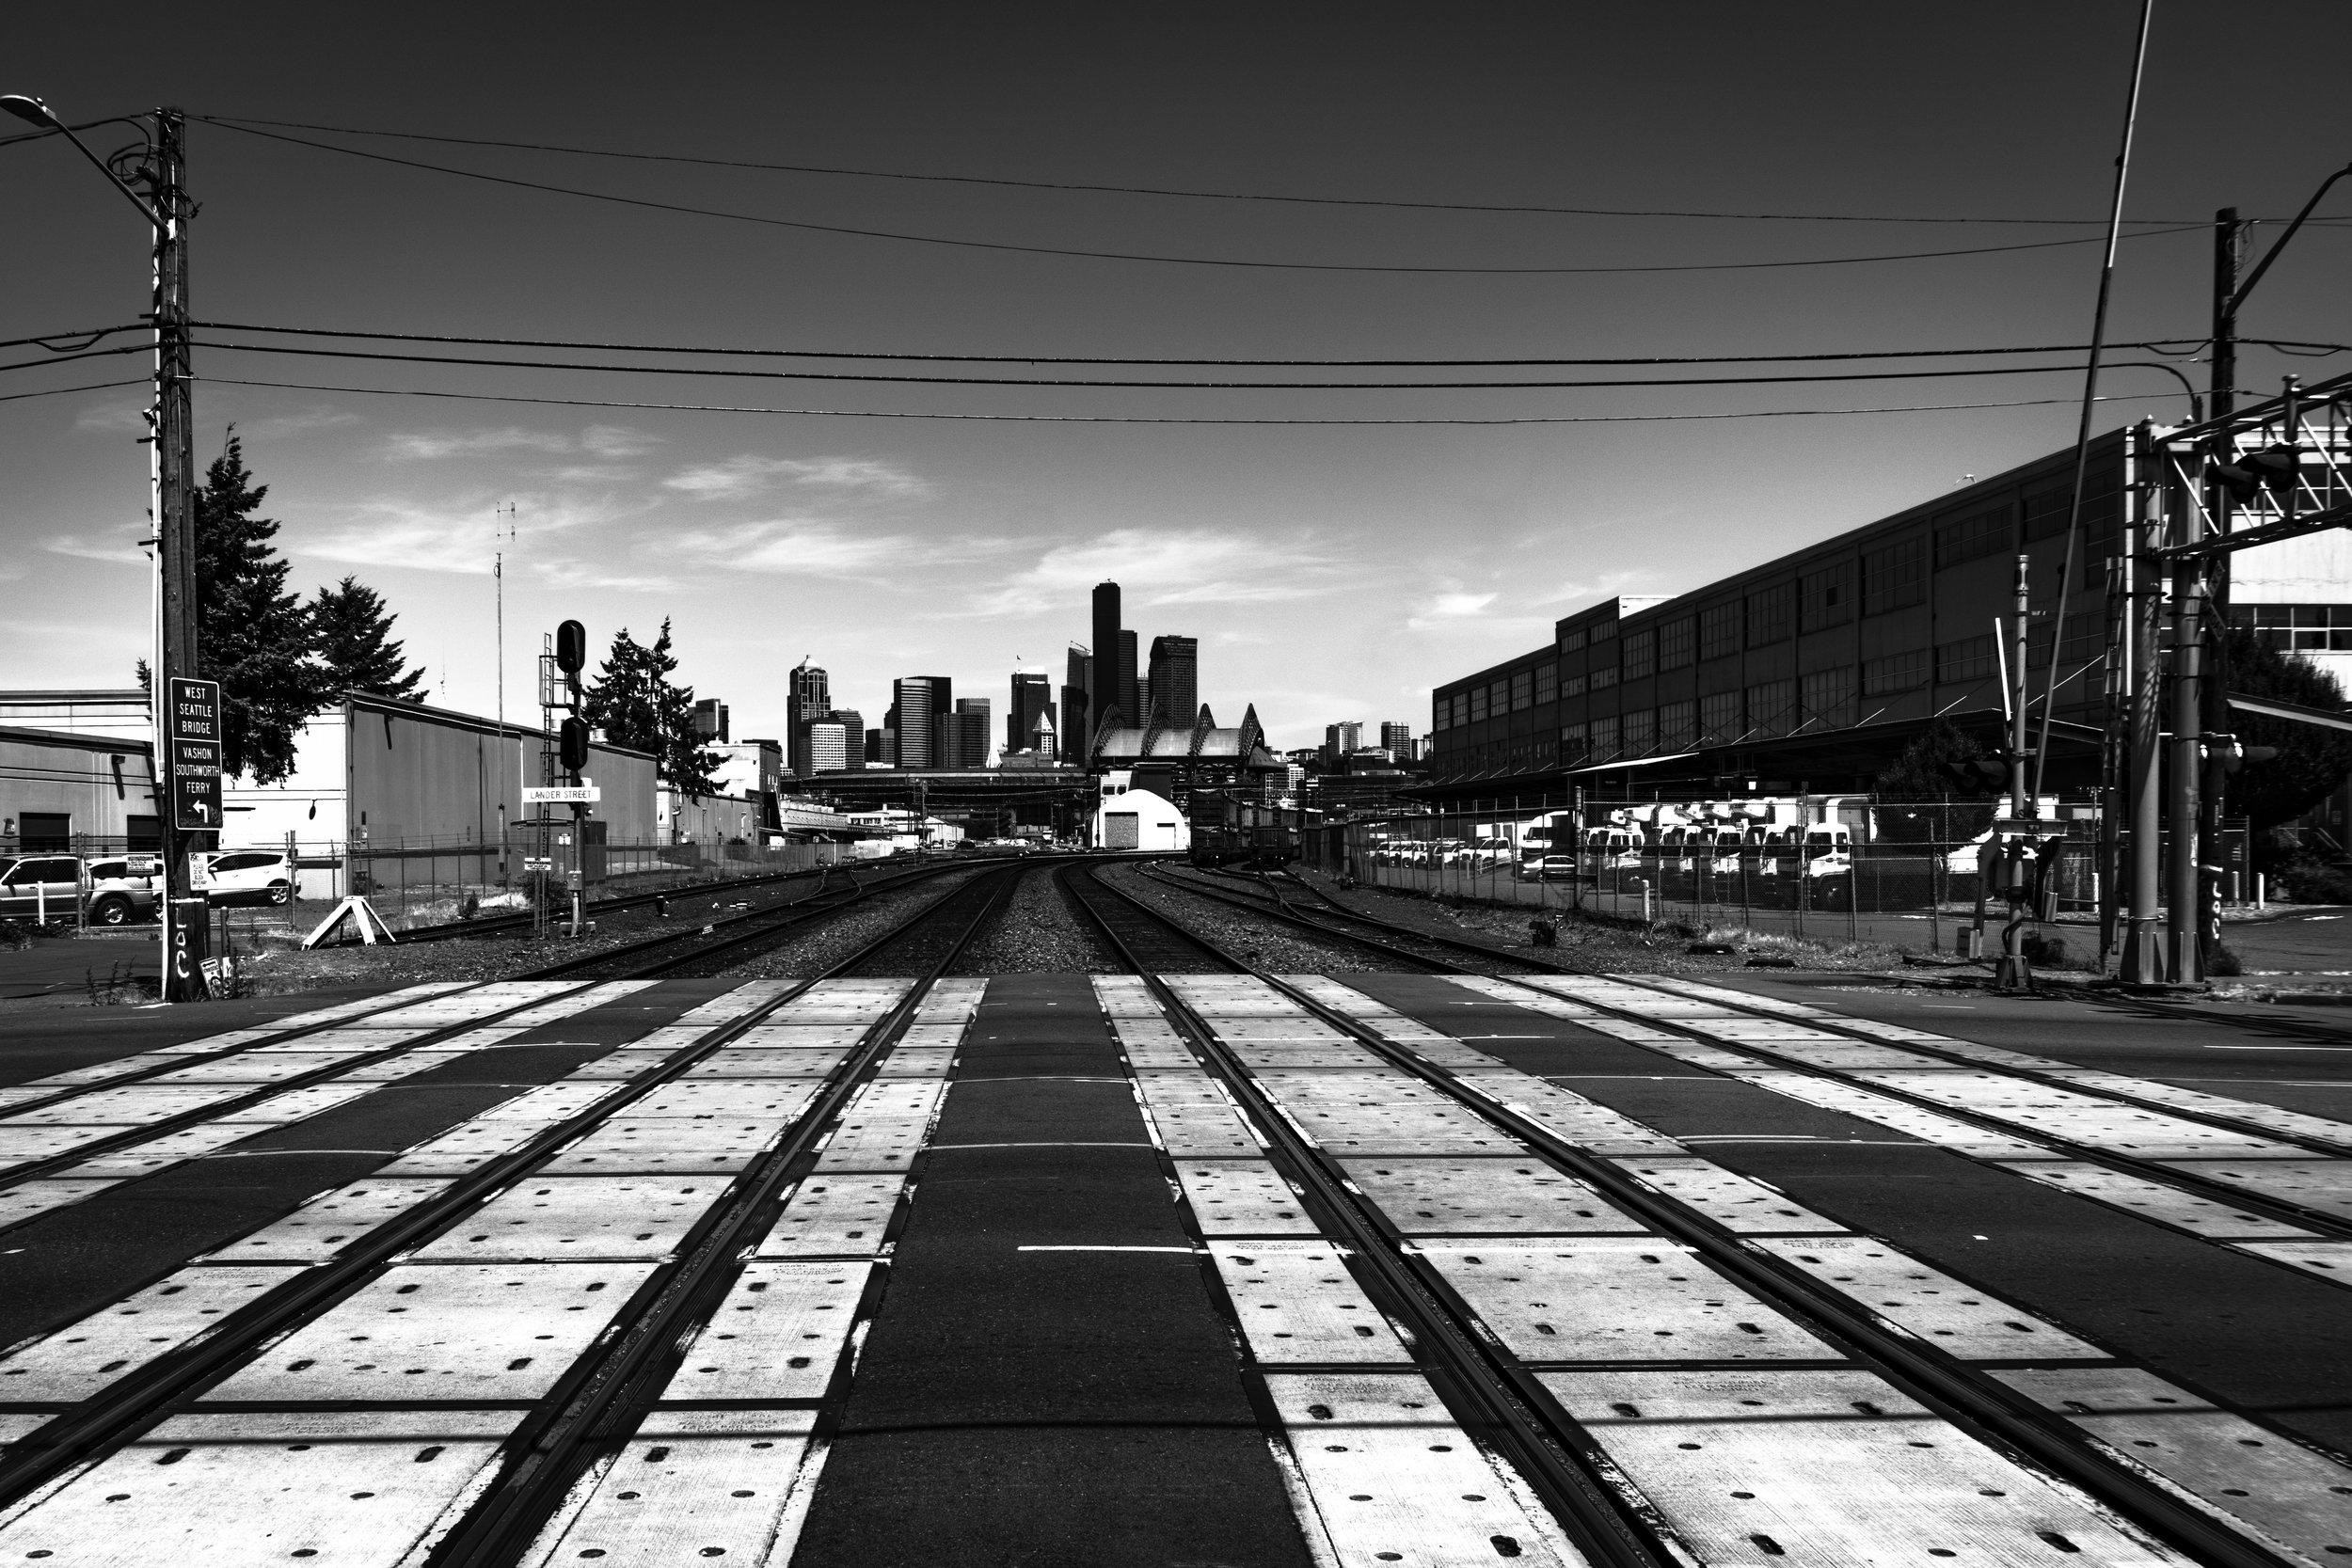 #artofvisuals #citybestpics #agameoftones #thecreative #citylimitless #heatercentral #guardiancities #urbandecay #urbexworld #streetmobs #Seattle #seattlewa #pnwonderland #VisitSeattle #LiveWashington #seattlepulse #streetphotography